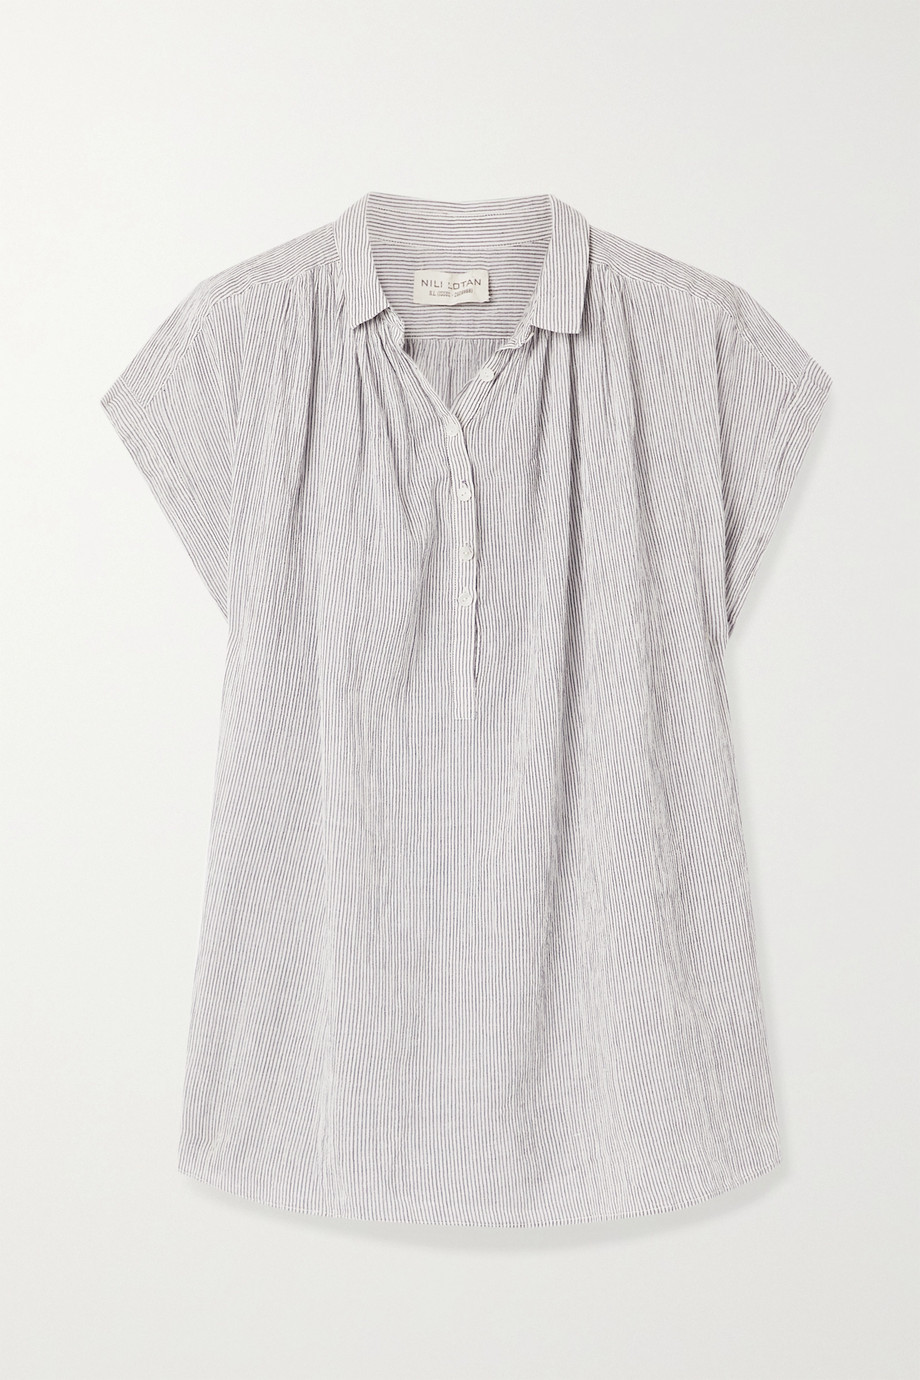 Nili Lotan Normandy striped cotton-voile blouse